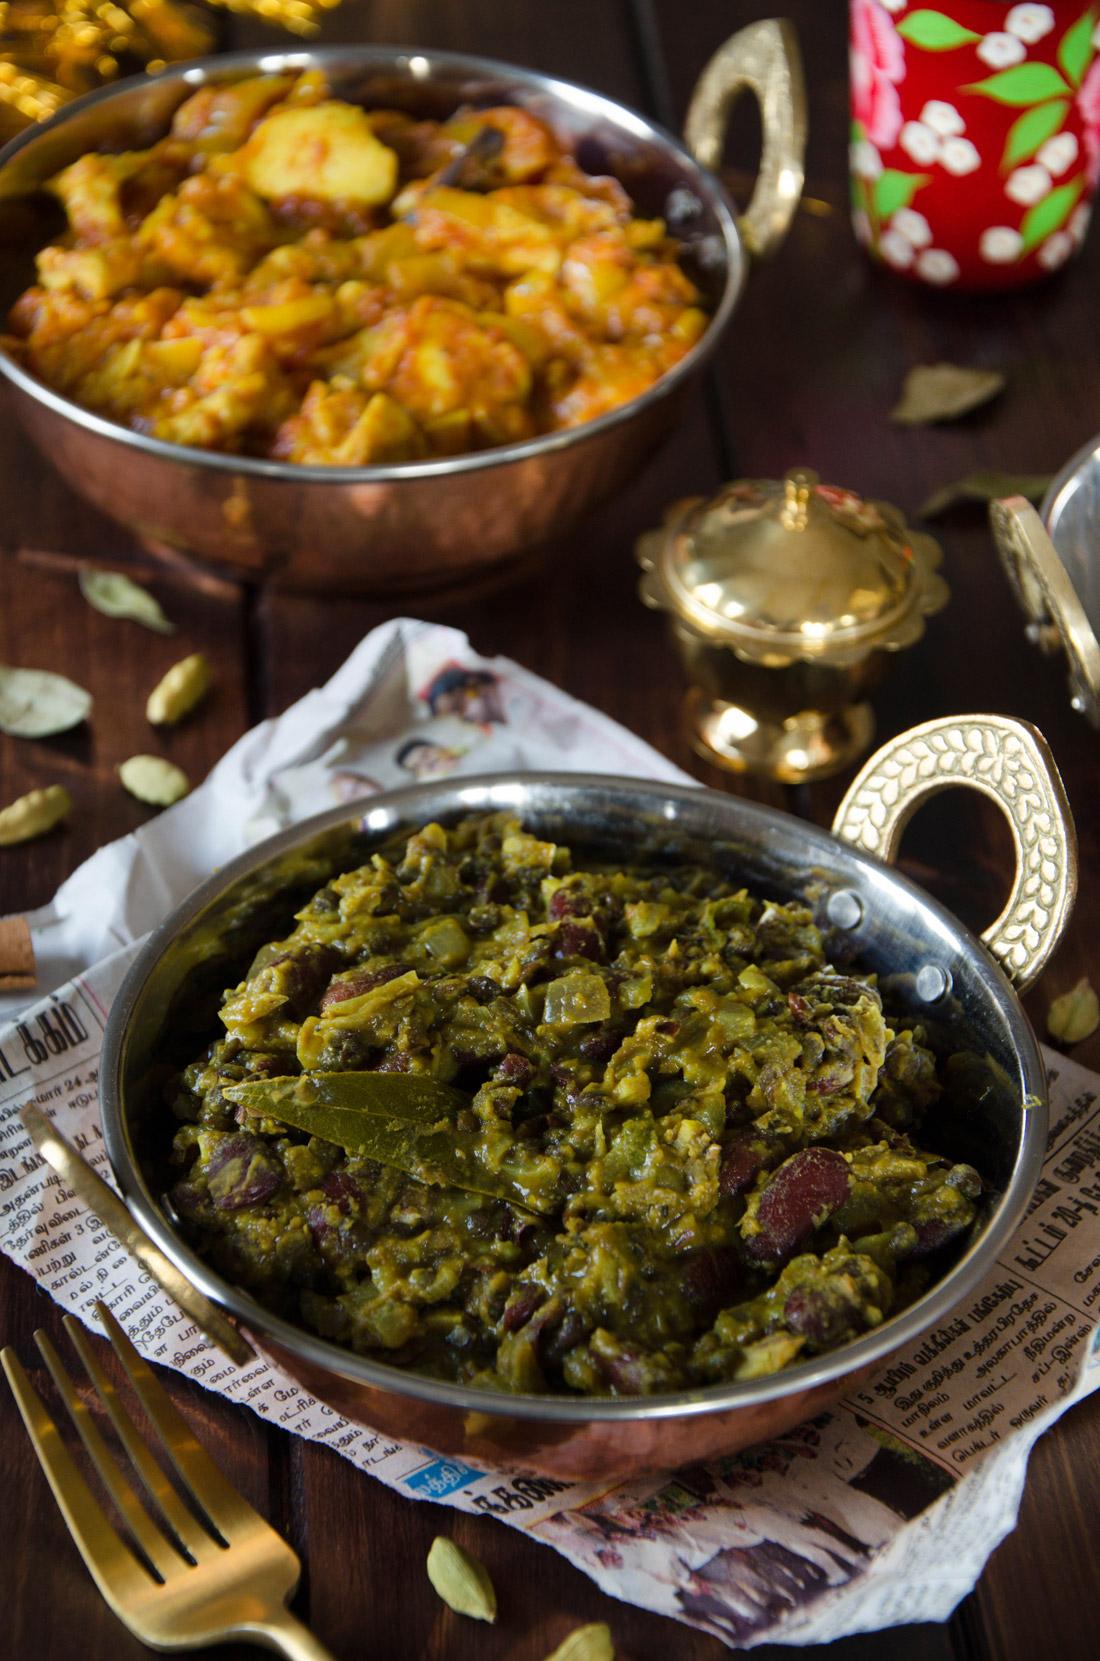 Recette de daal makhani, accompagnement indien